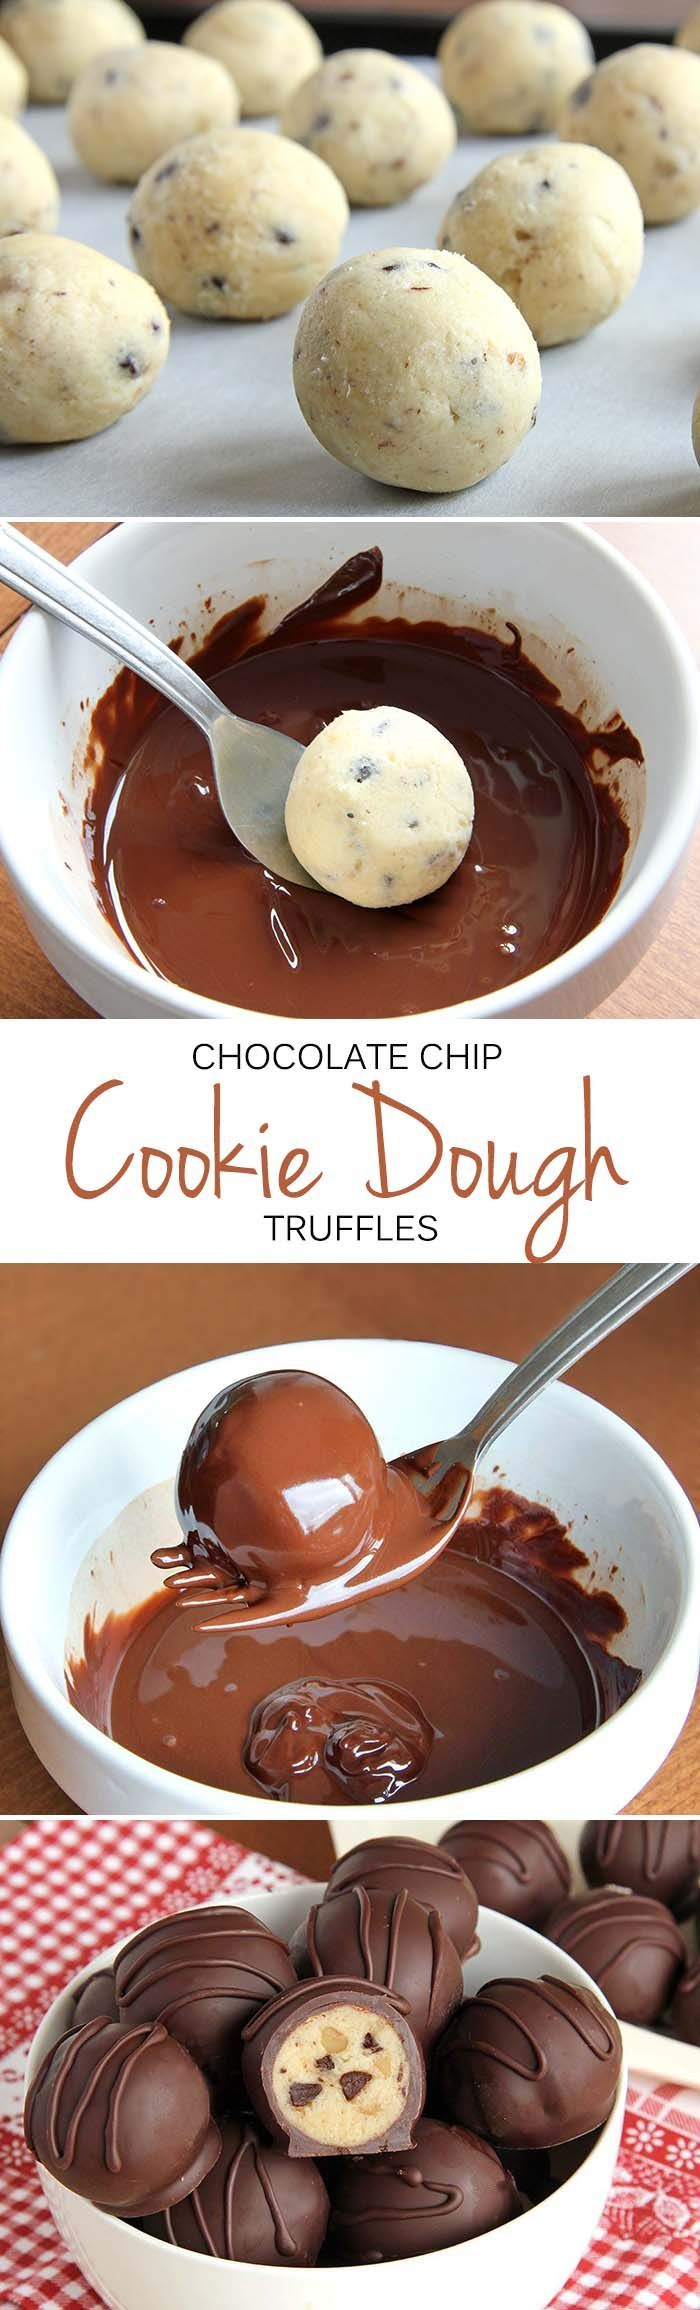 Chocolate Chip Cookie Dough Truffles Cakescottage Recipe Chocolate Chip Cookie Dough Truffles Chocolate Chip Cookie Dough Desserts